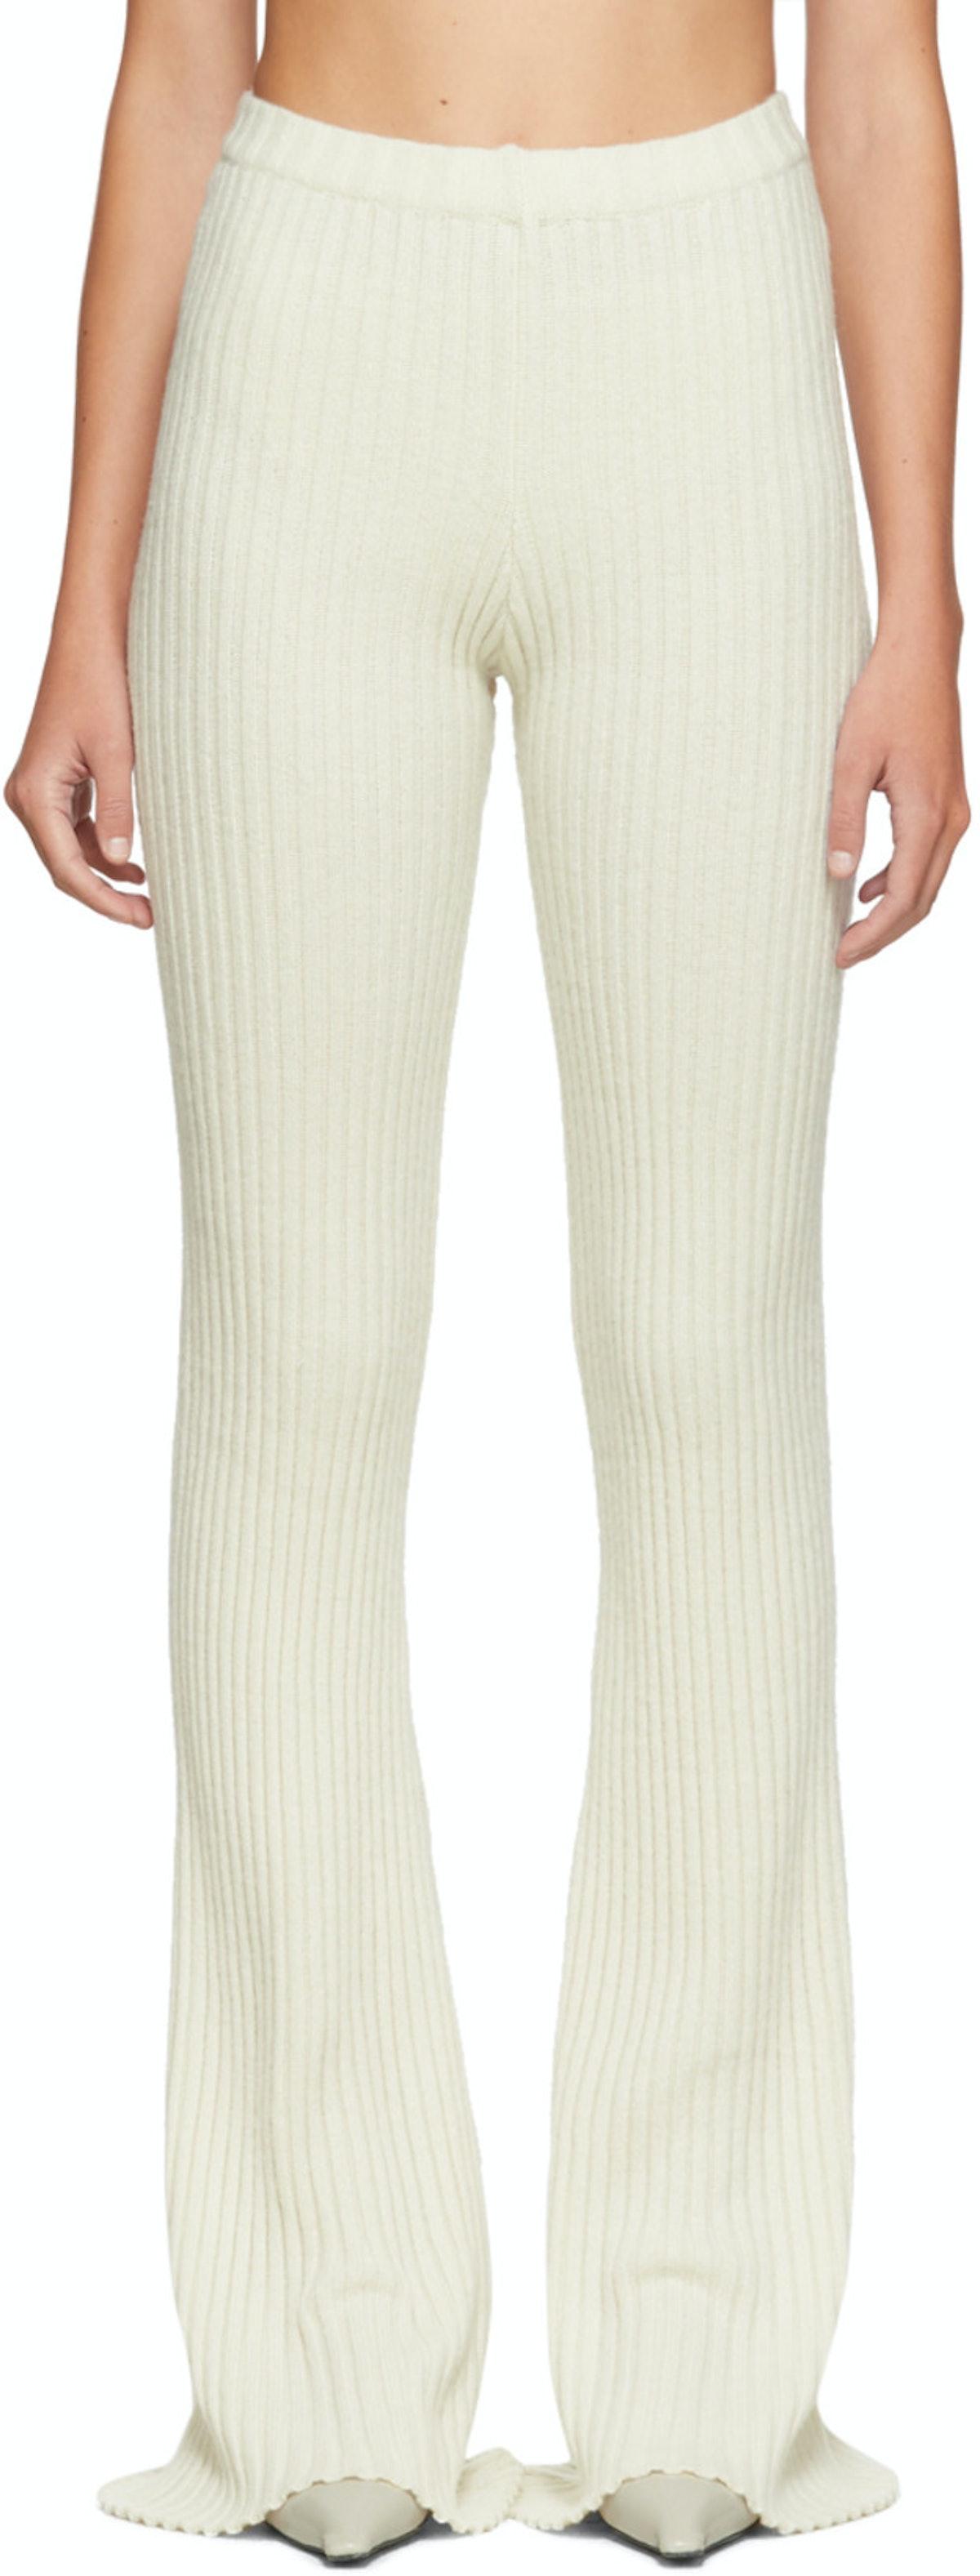 Off-White Rib Knit Lounge Pants